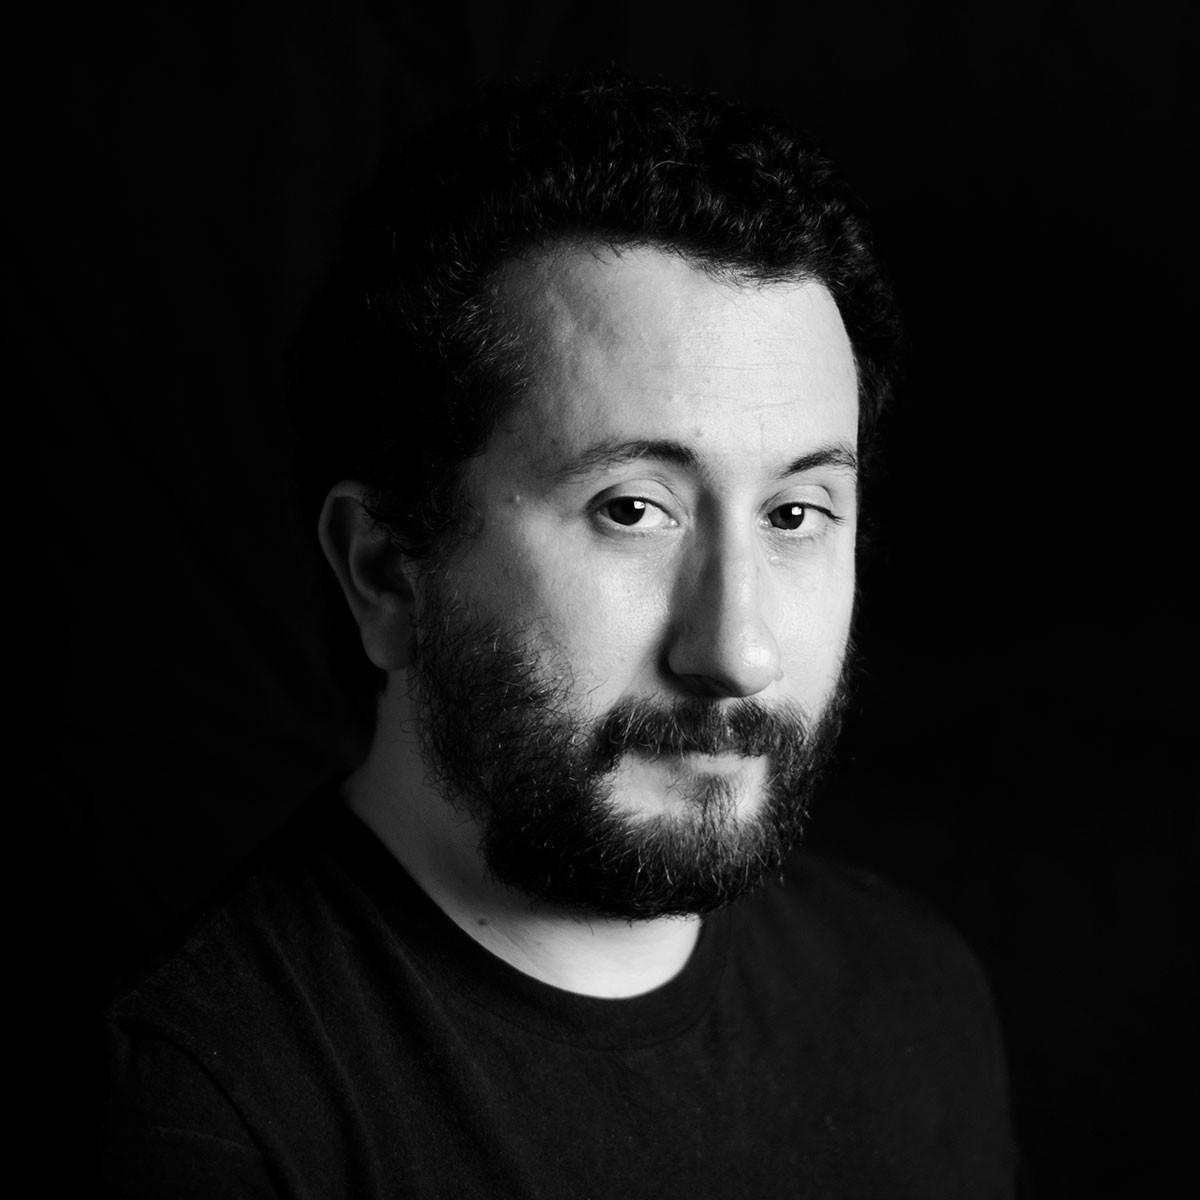 Alessandro Violi